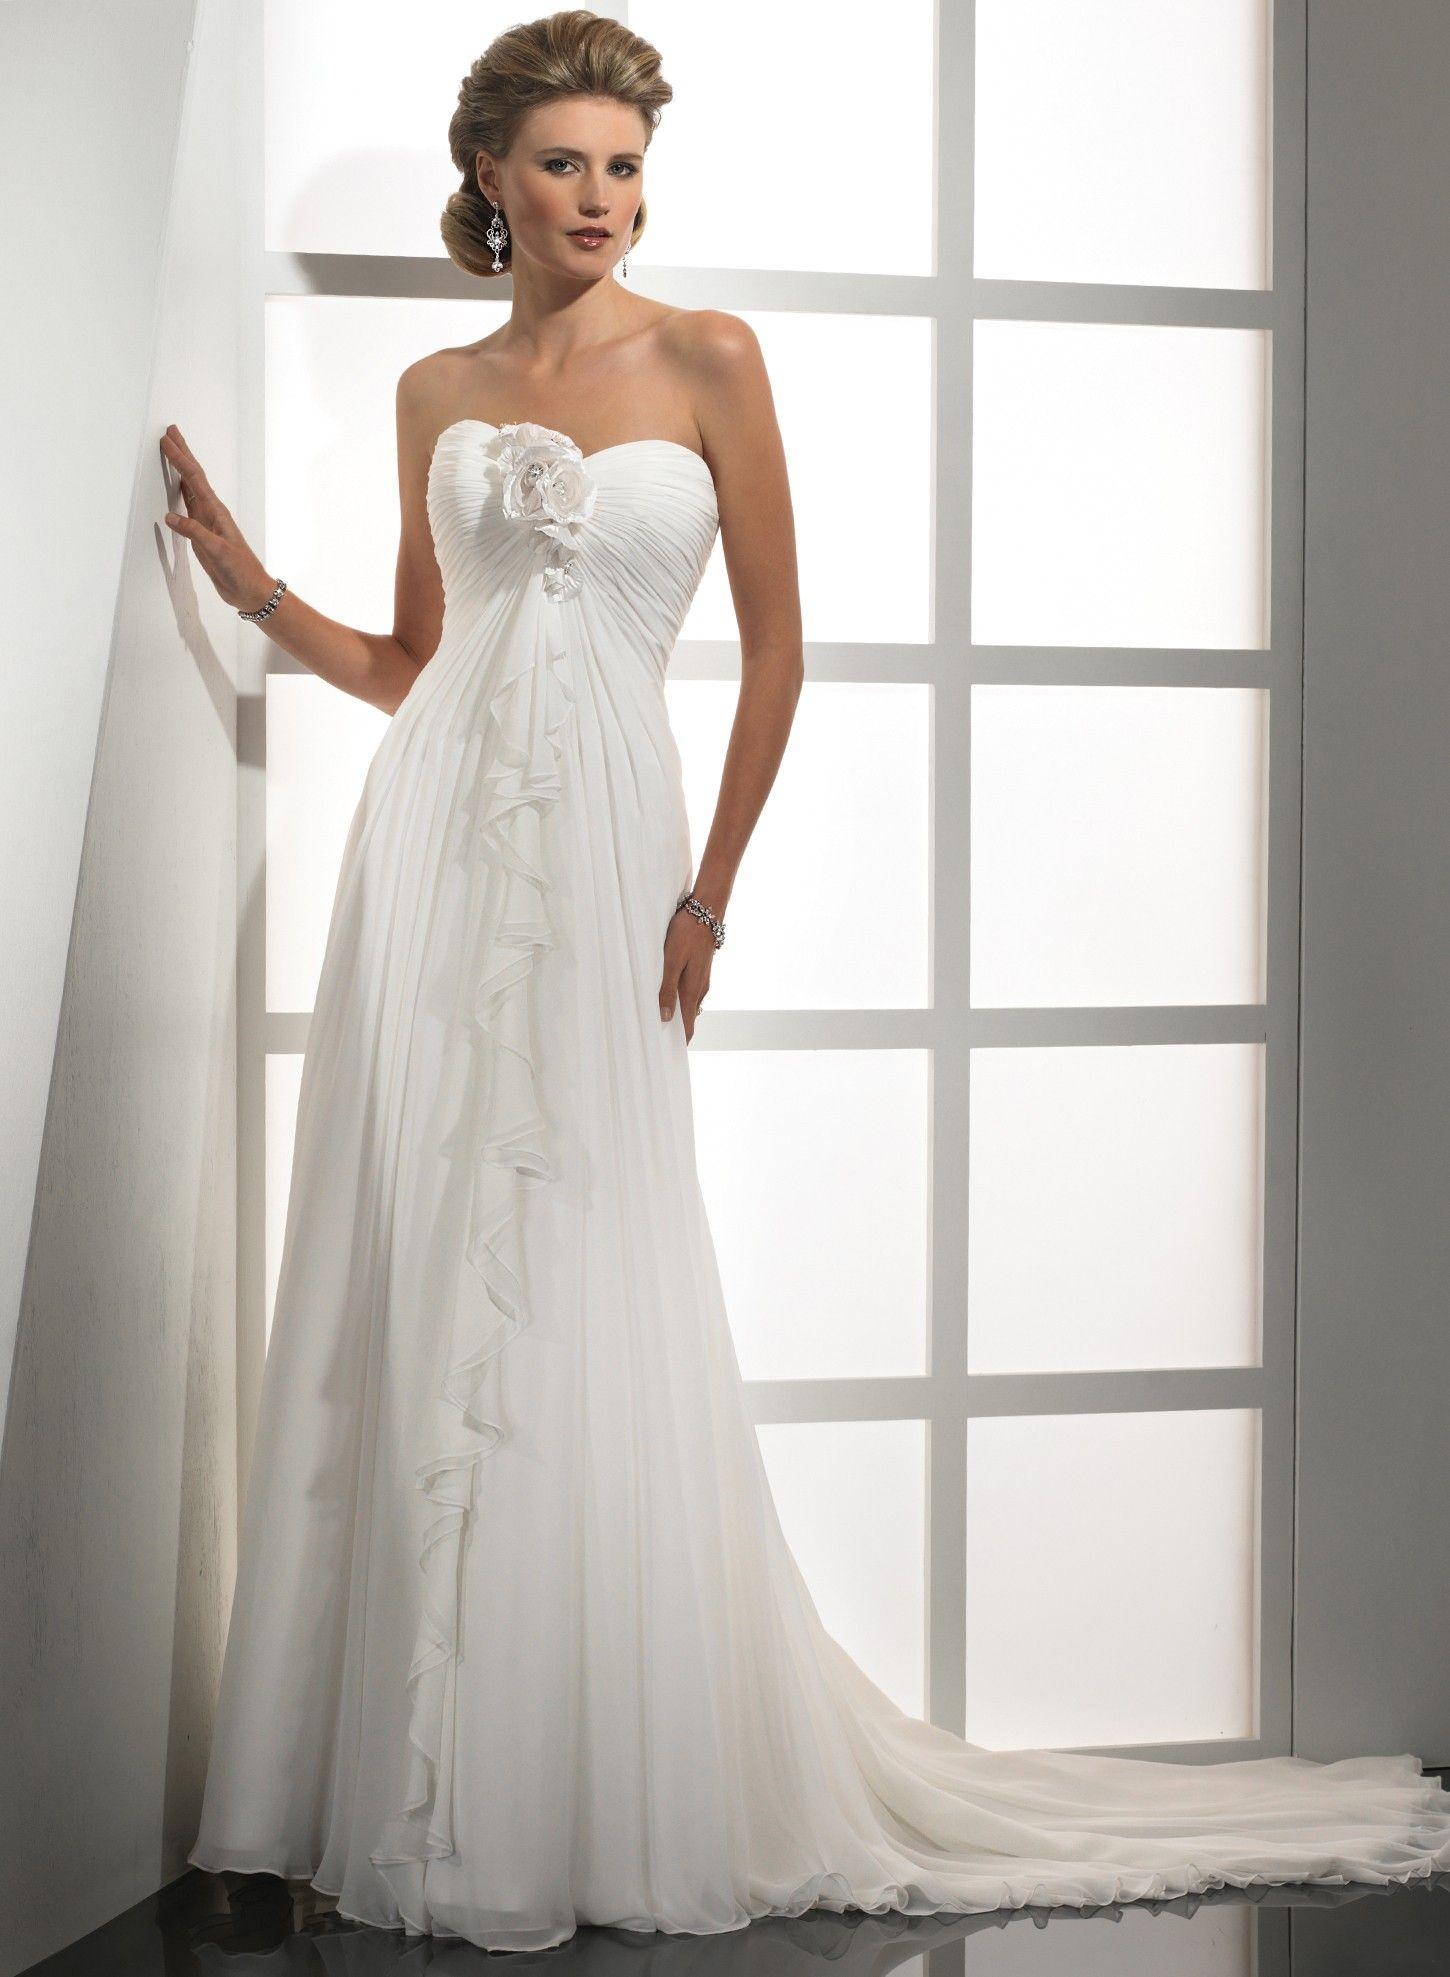 Gossamer Chiffon A-line Strapless Sweetheart Neckline A-line Wedding ...